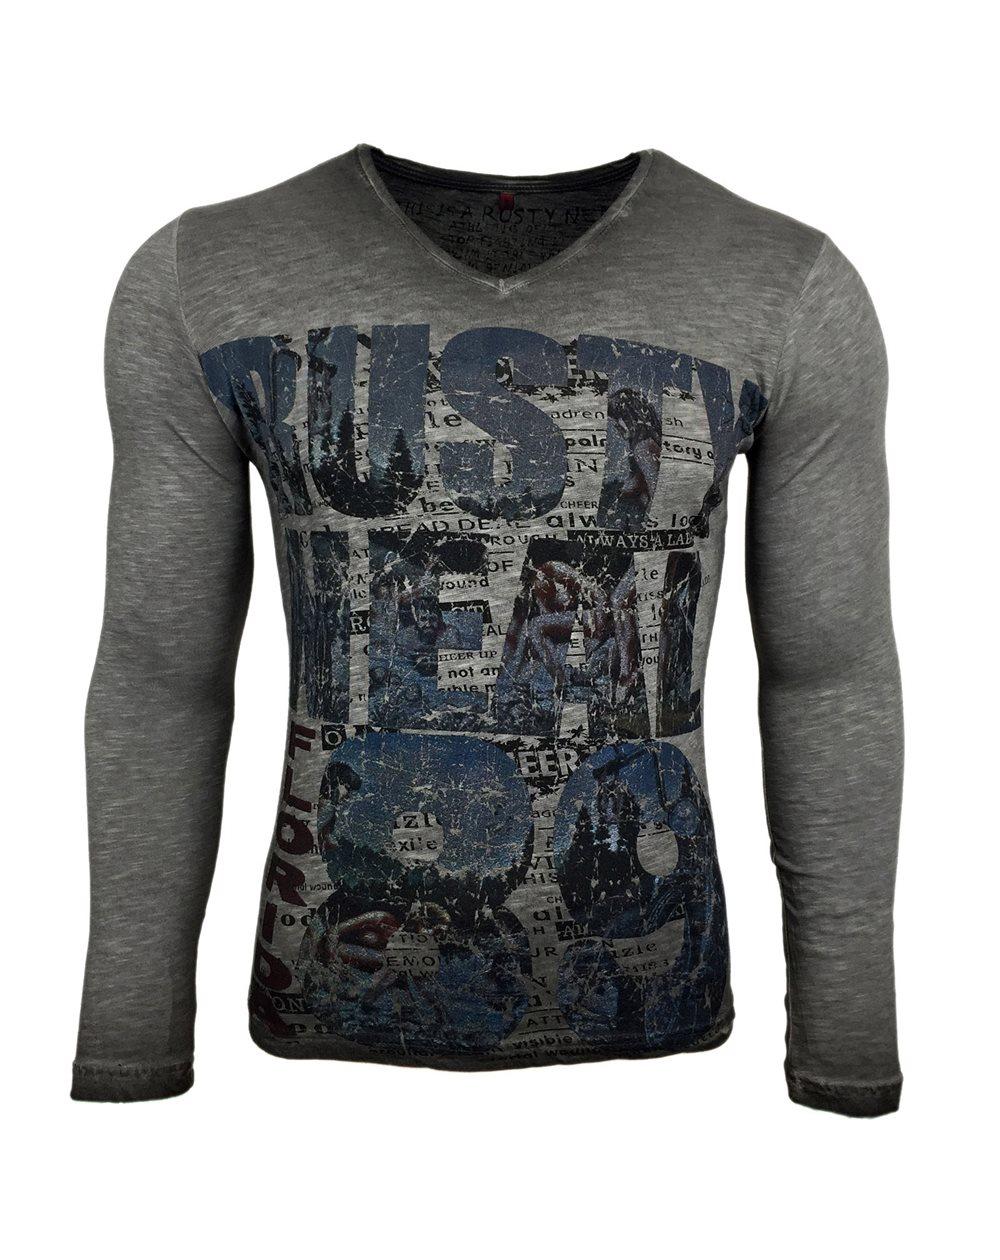 Subliminal Mode - Tee shirt delaver homme manches longues col V SB10113